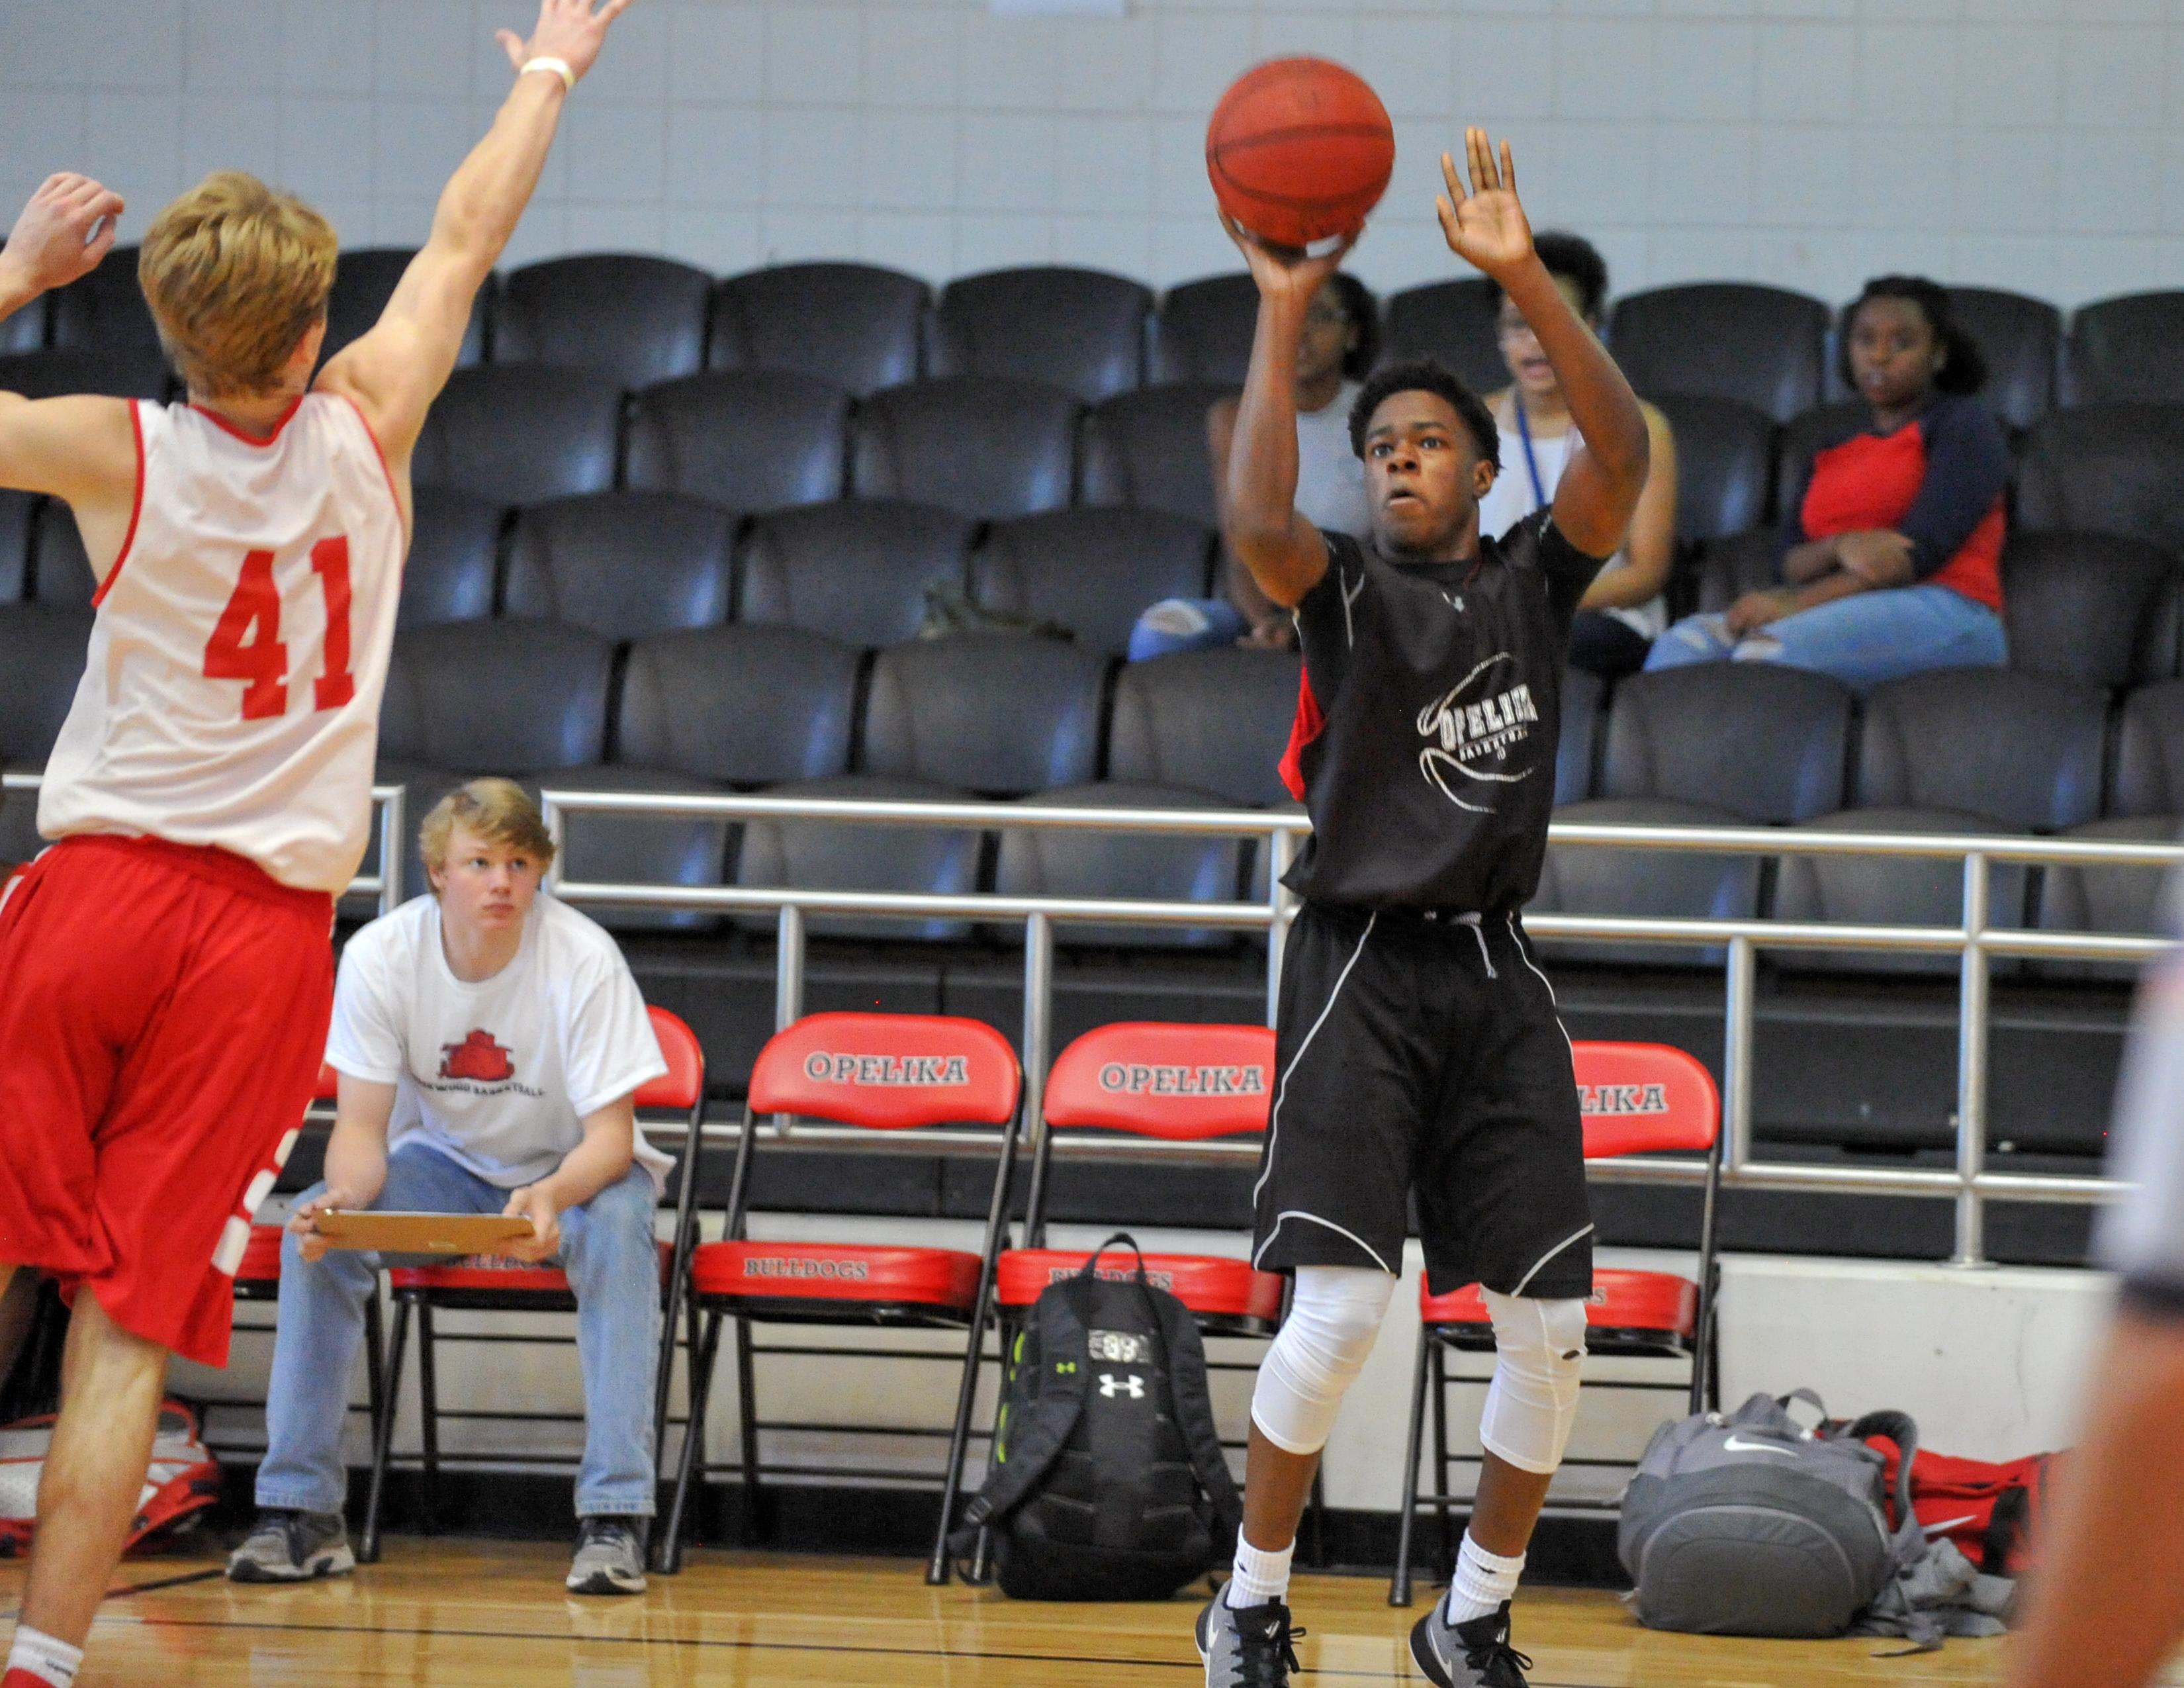 Ohs Basketball Camp – Ohio Youth Girls Basketball